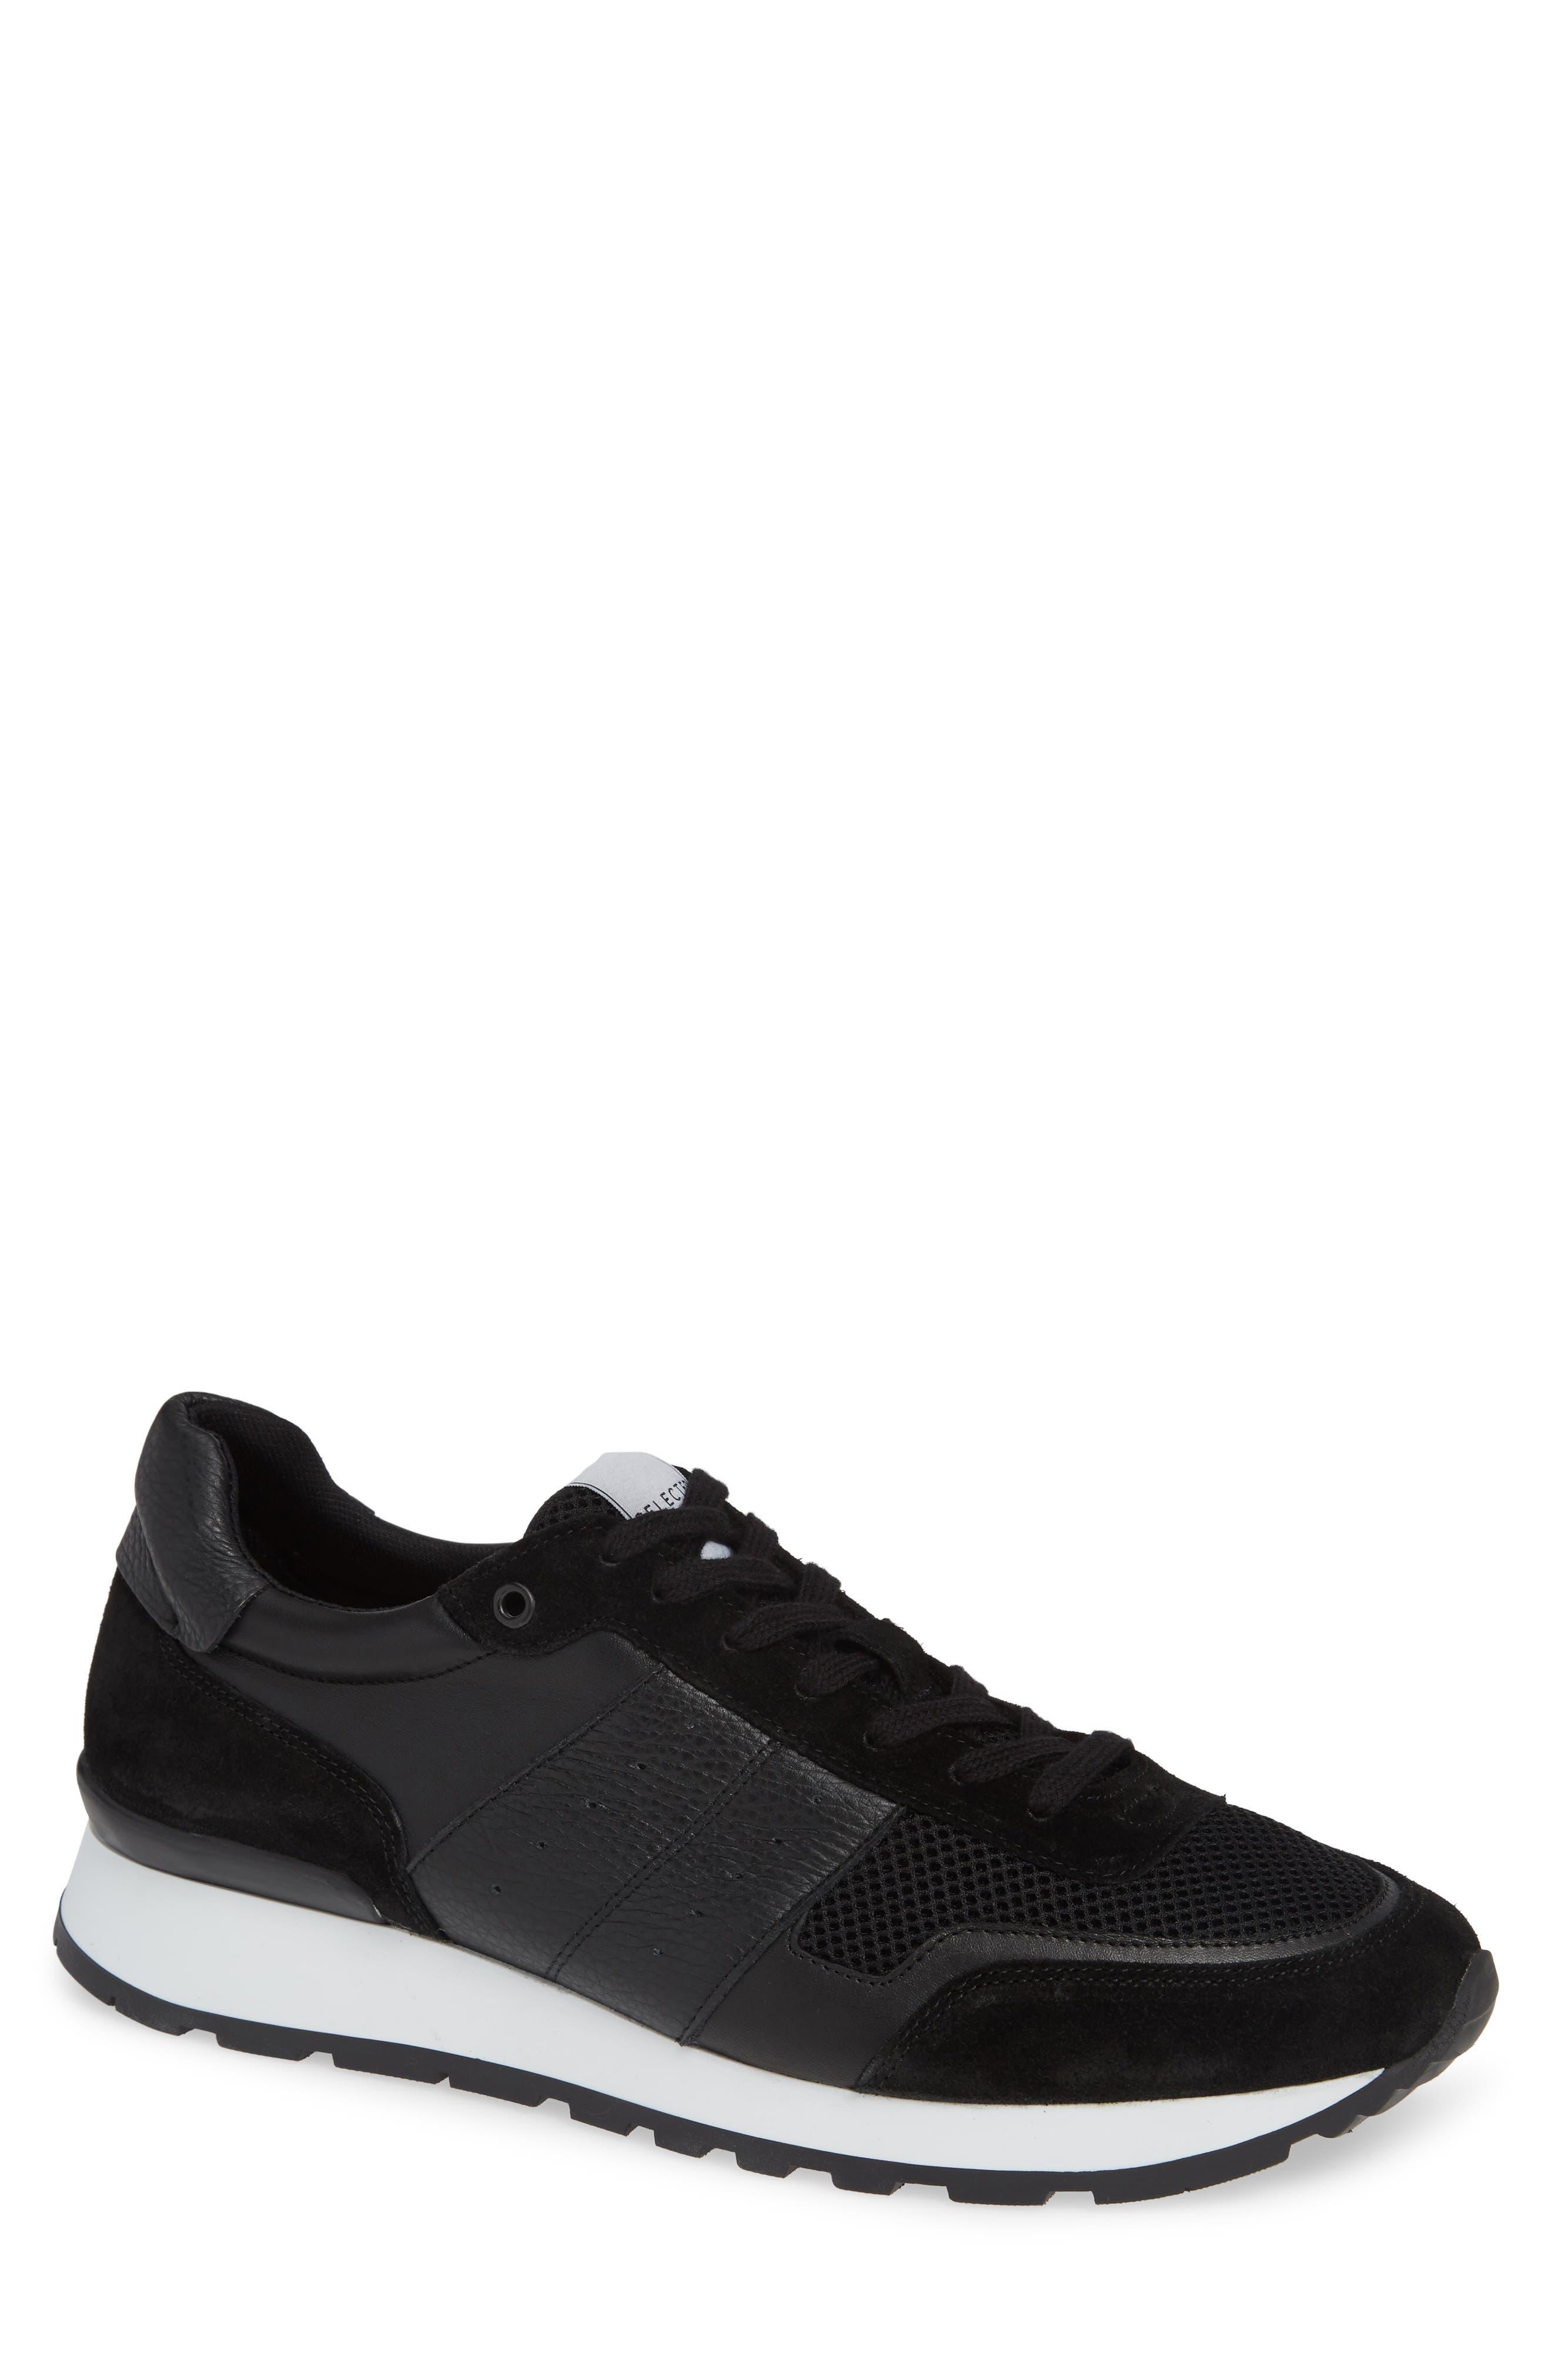 Frank Mix Runner Sneaker,                             Main thumbnail 1, color,                             BLACK